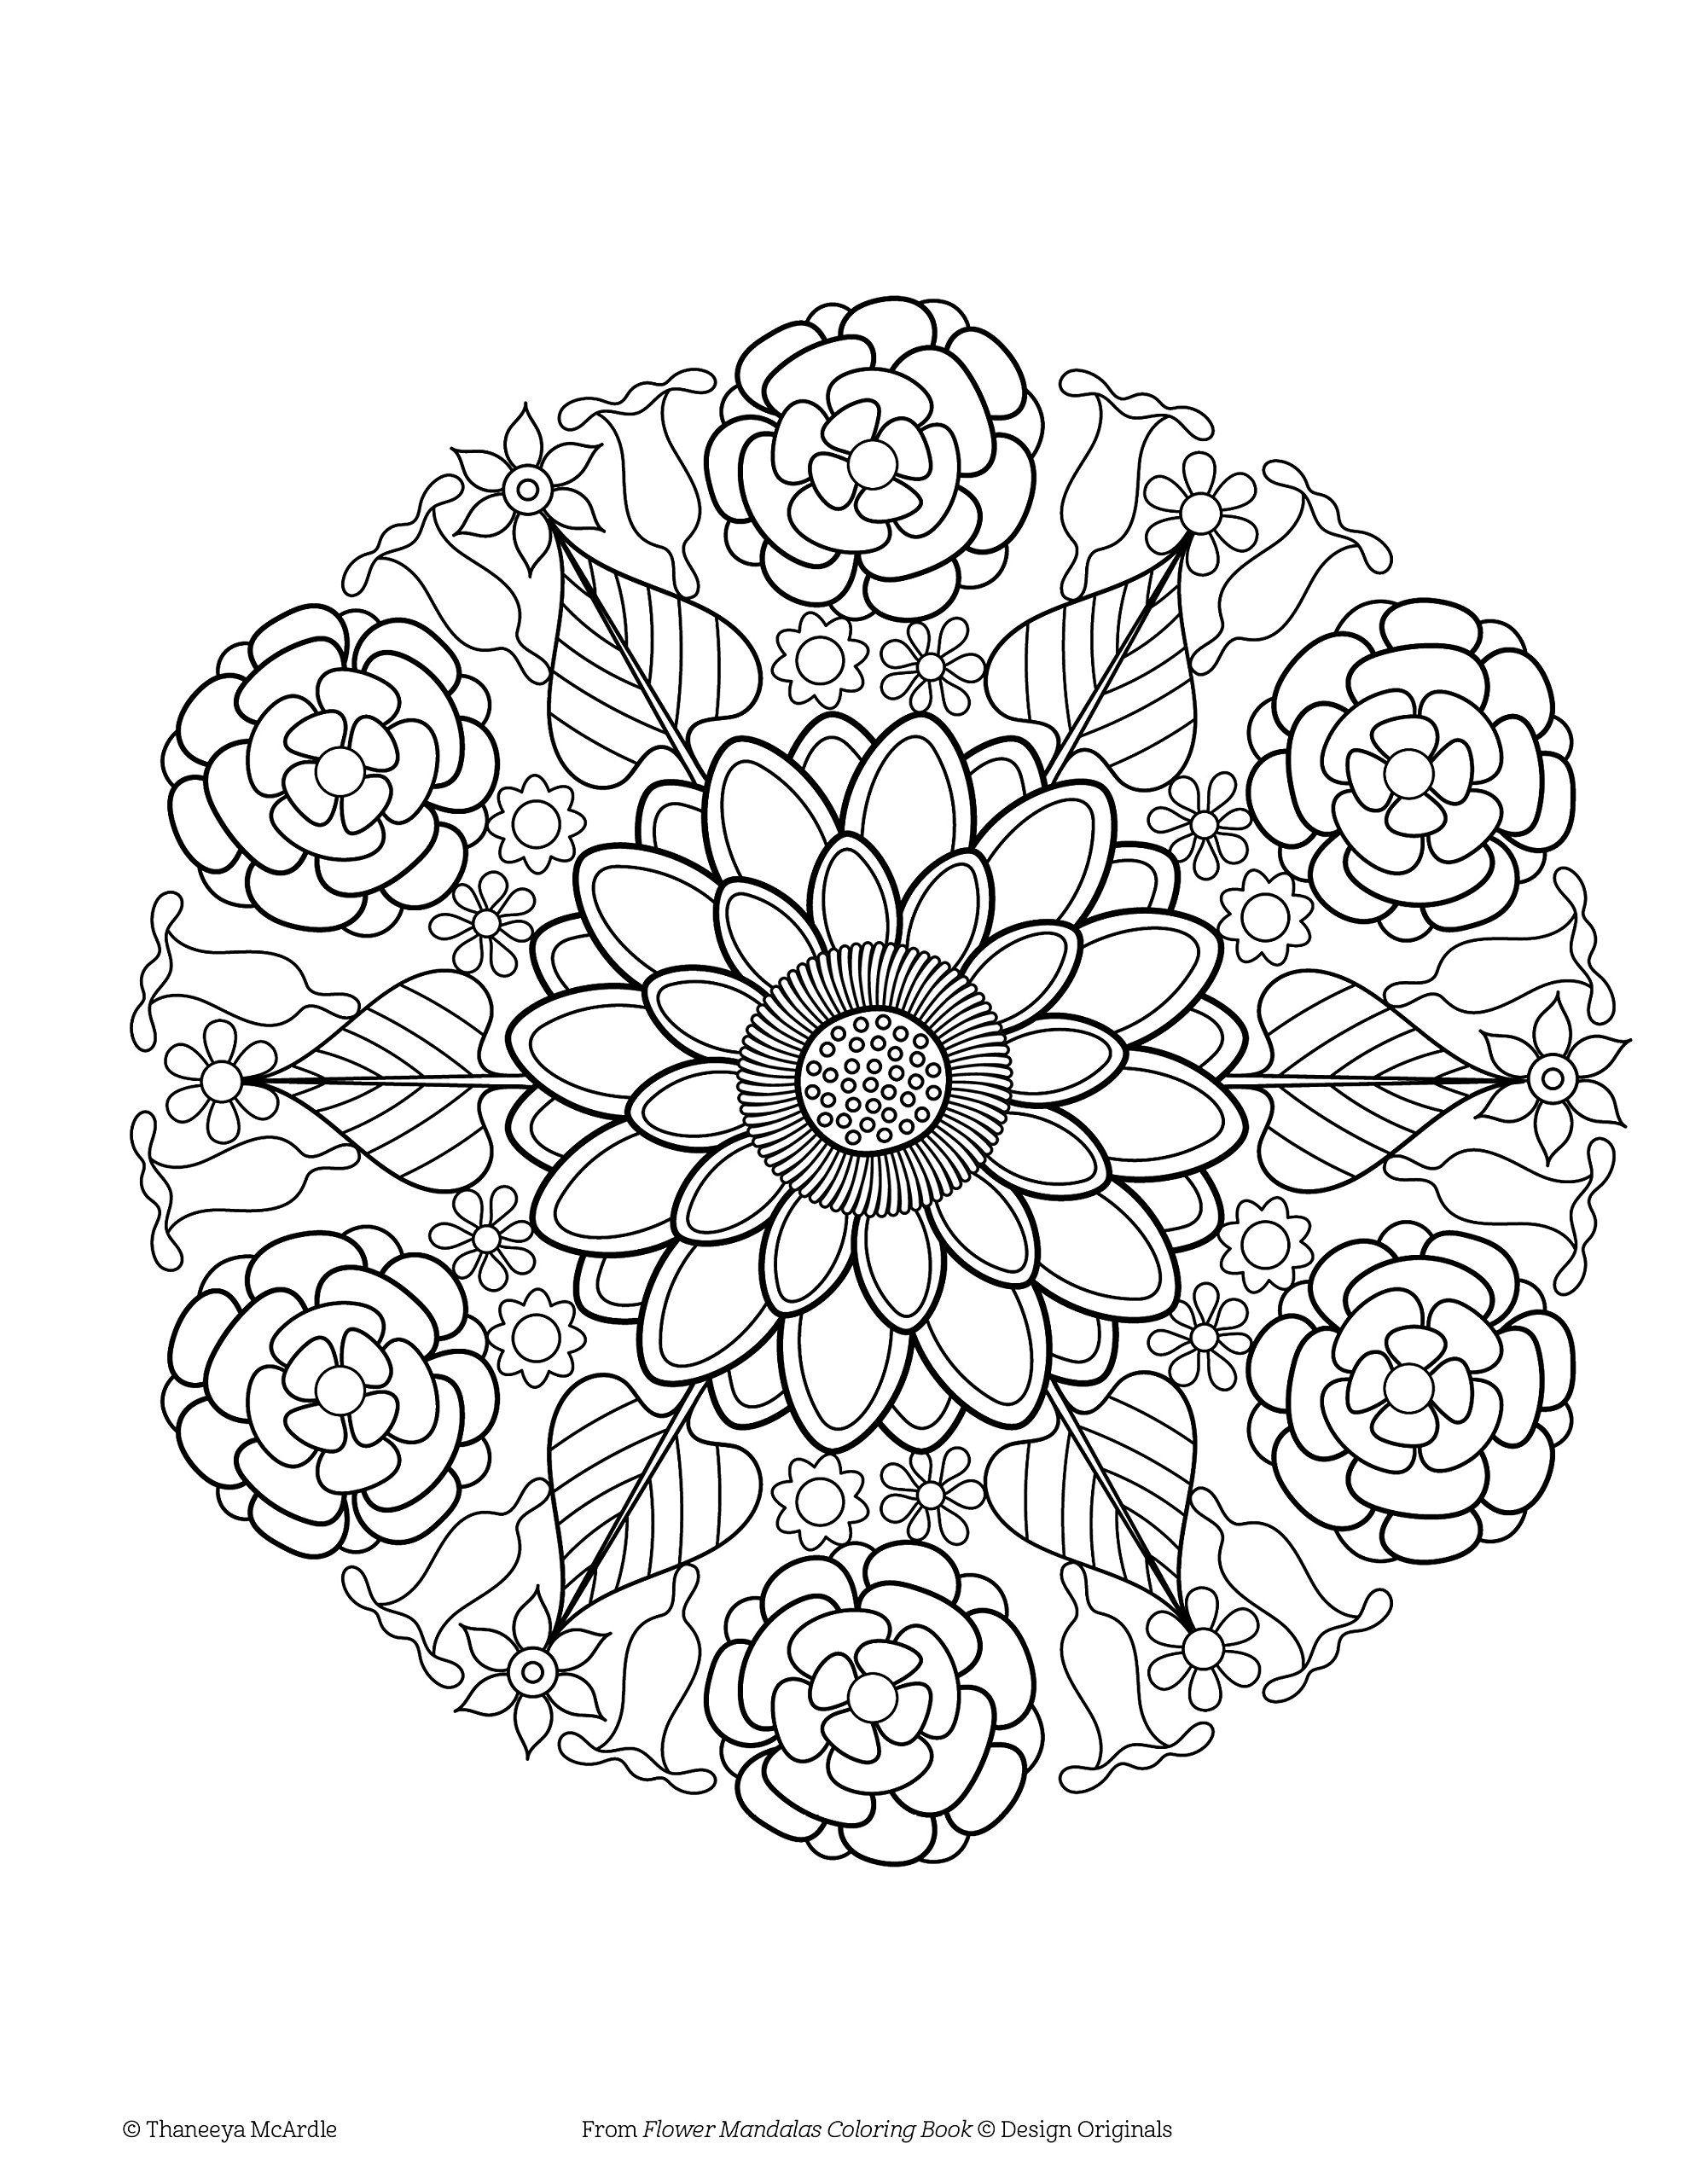 Flower Mandalas Coloring Book Design Originals 30 Beginner Friendly Mandala Coloring Books Mandala Flower Design Mandala Coloring